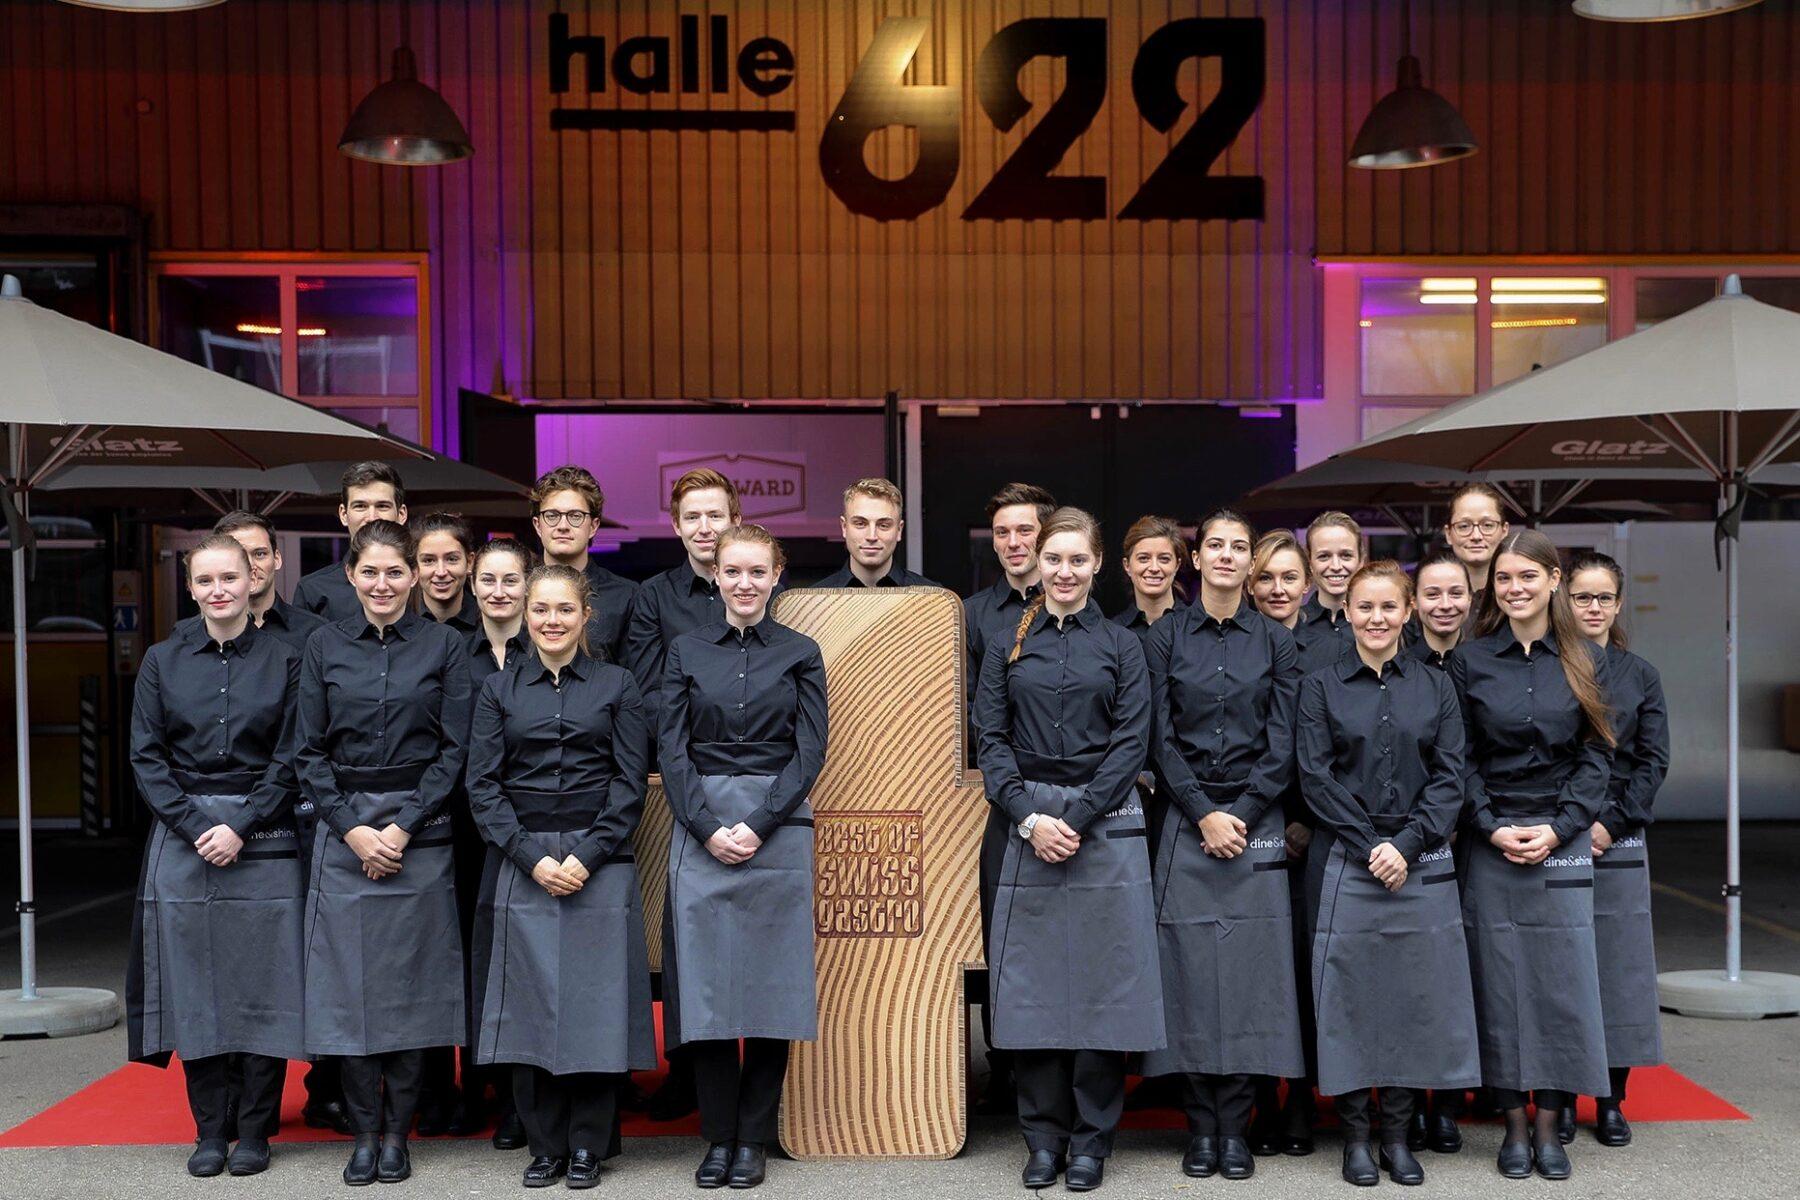 13.11. - Best Of Swiss Gastro Award - Halle 622 ZH 2